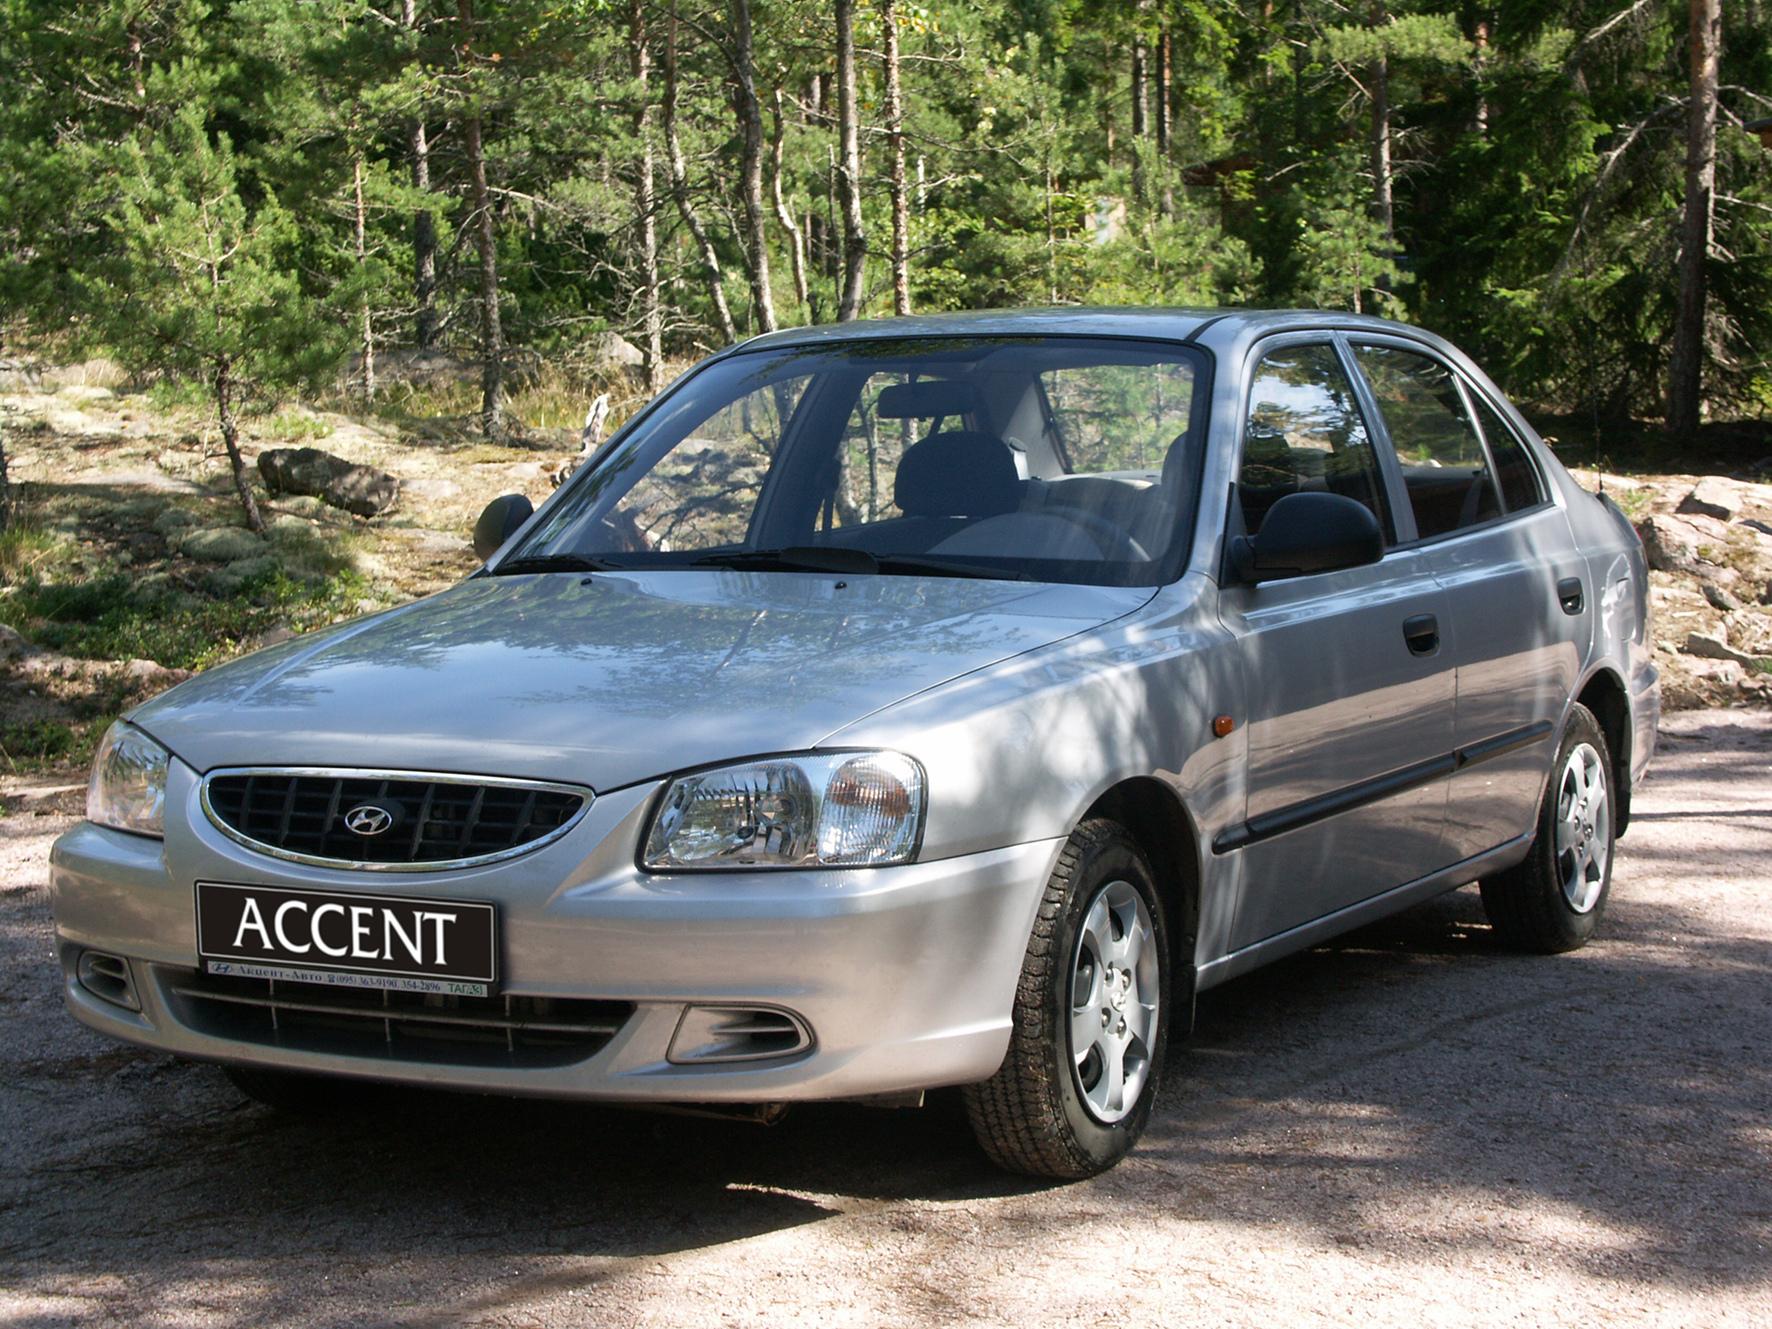 Hyndai Accent за 150 000 рублей